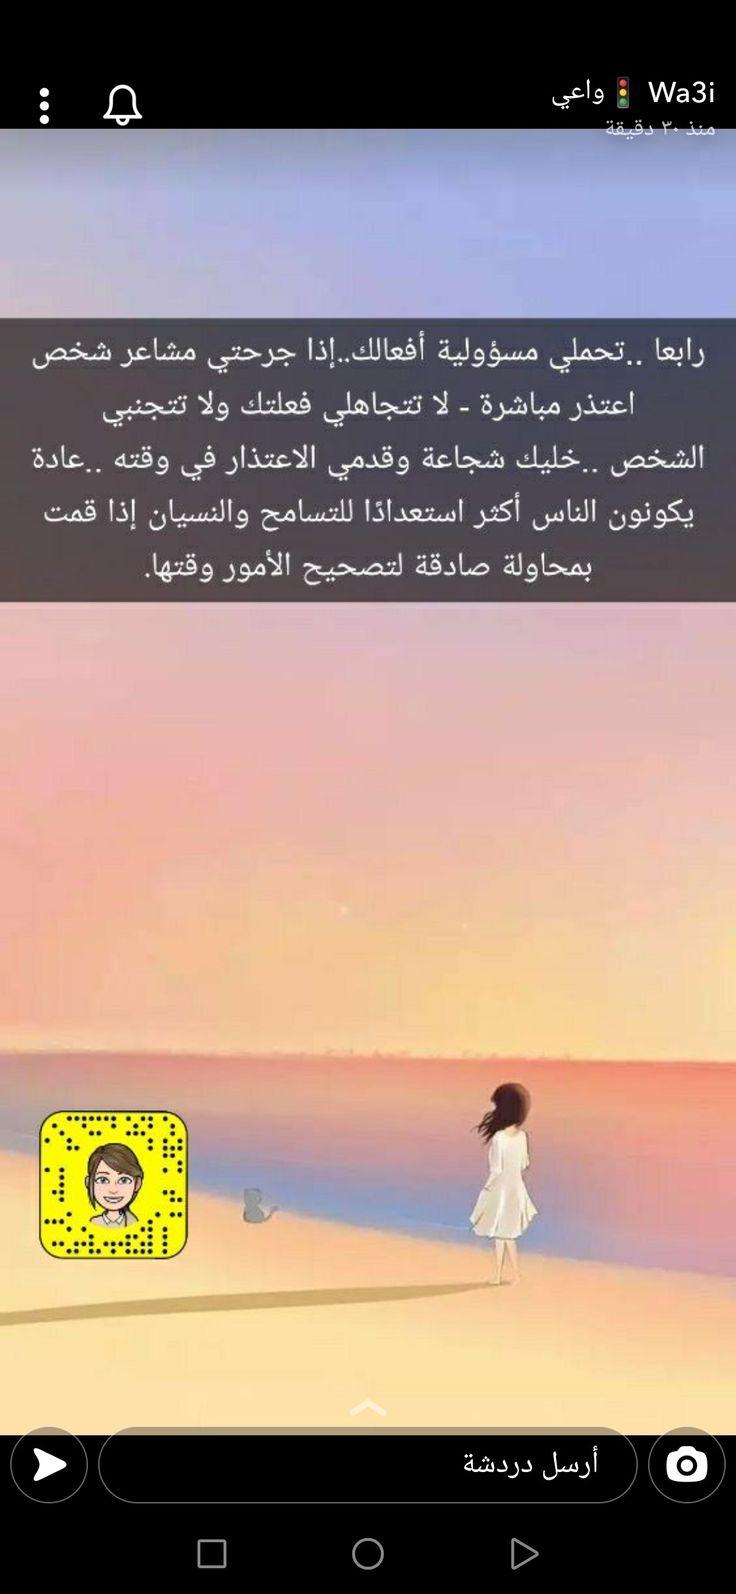 Pin By Hajar Abdally On مشروعات تستحق التجربة In 2021 Psychology Quotes Advice